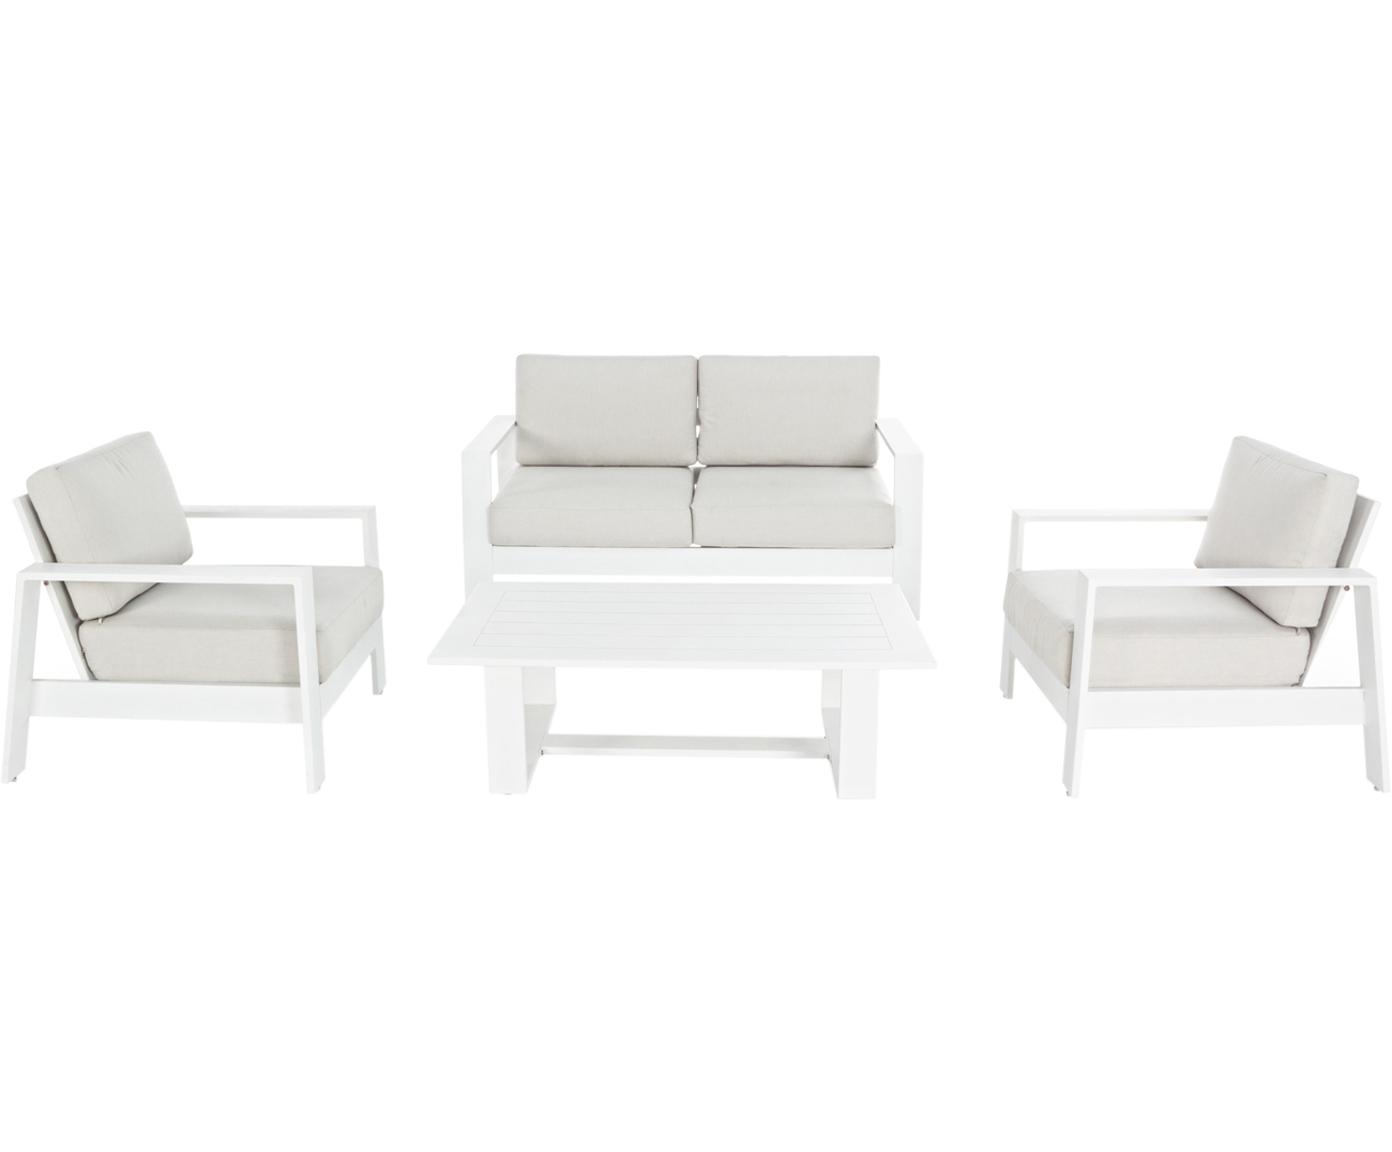 Set lounge de exterior Atlantic, 4pzas., Estructura: aluminio con pintura en p, Tapizado: poliéster, Blanco, gris claro, Tamaños diferentes